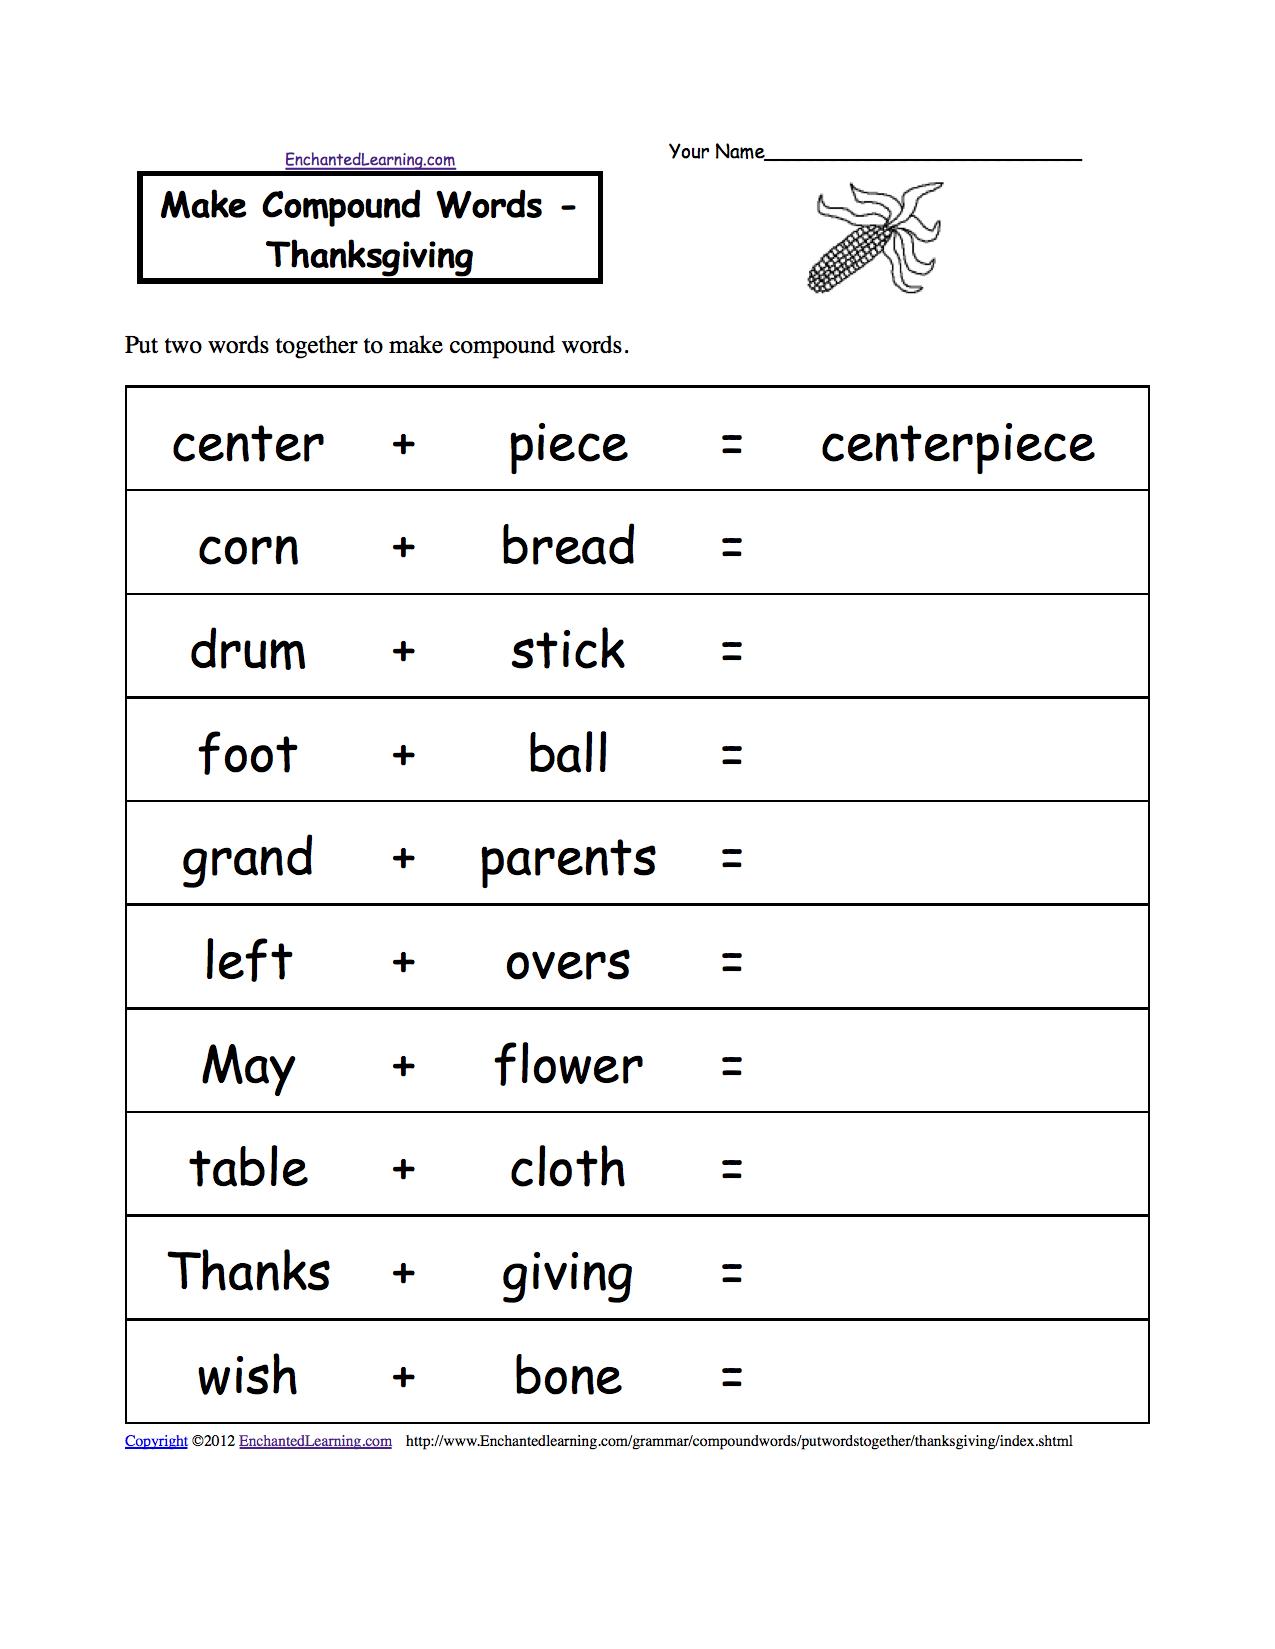 Thanksgiving Worksheets For 3rd Grade The Best Worksheets Image